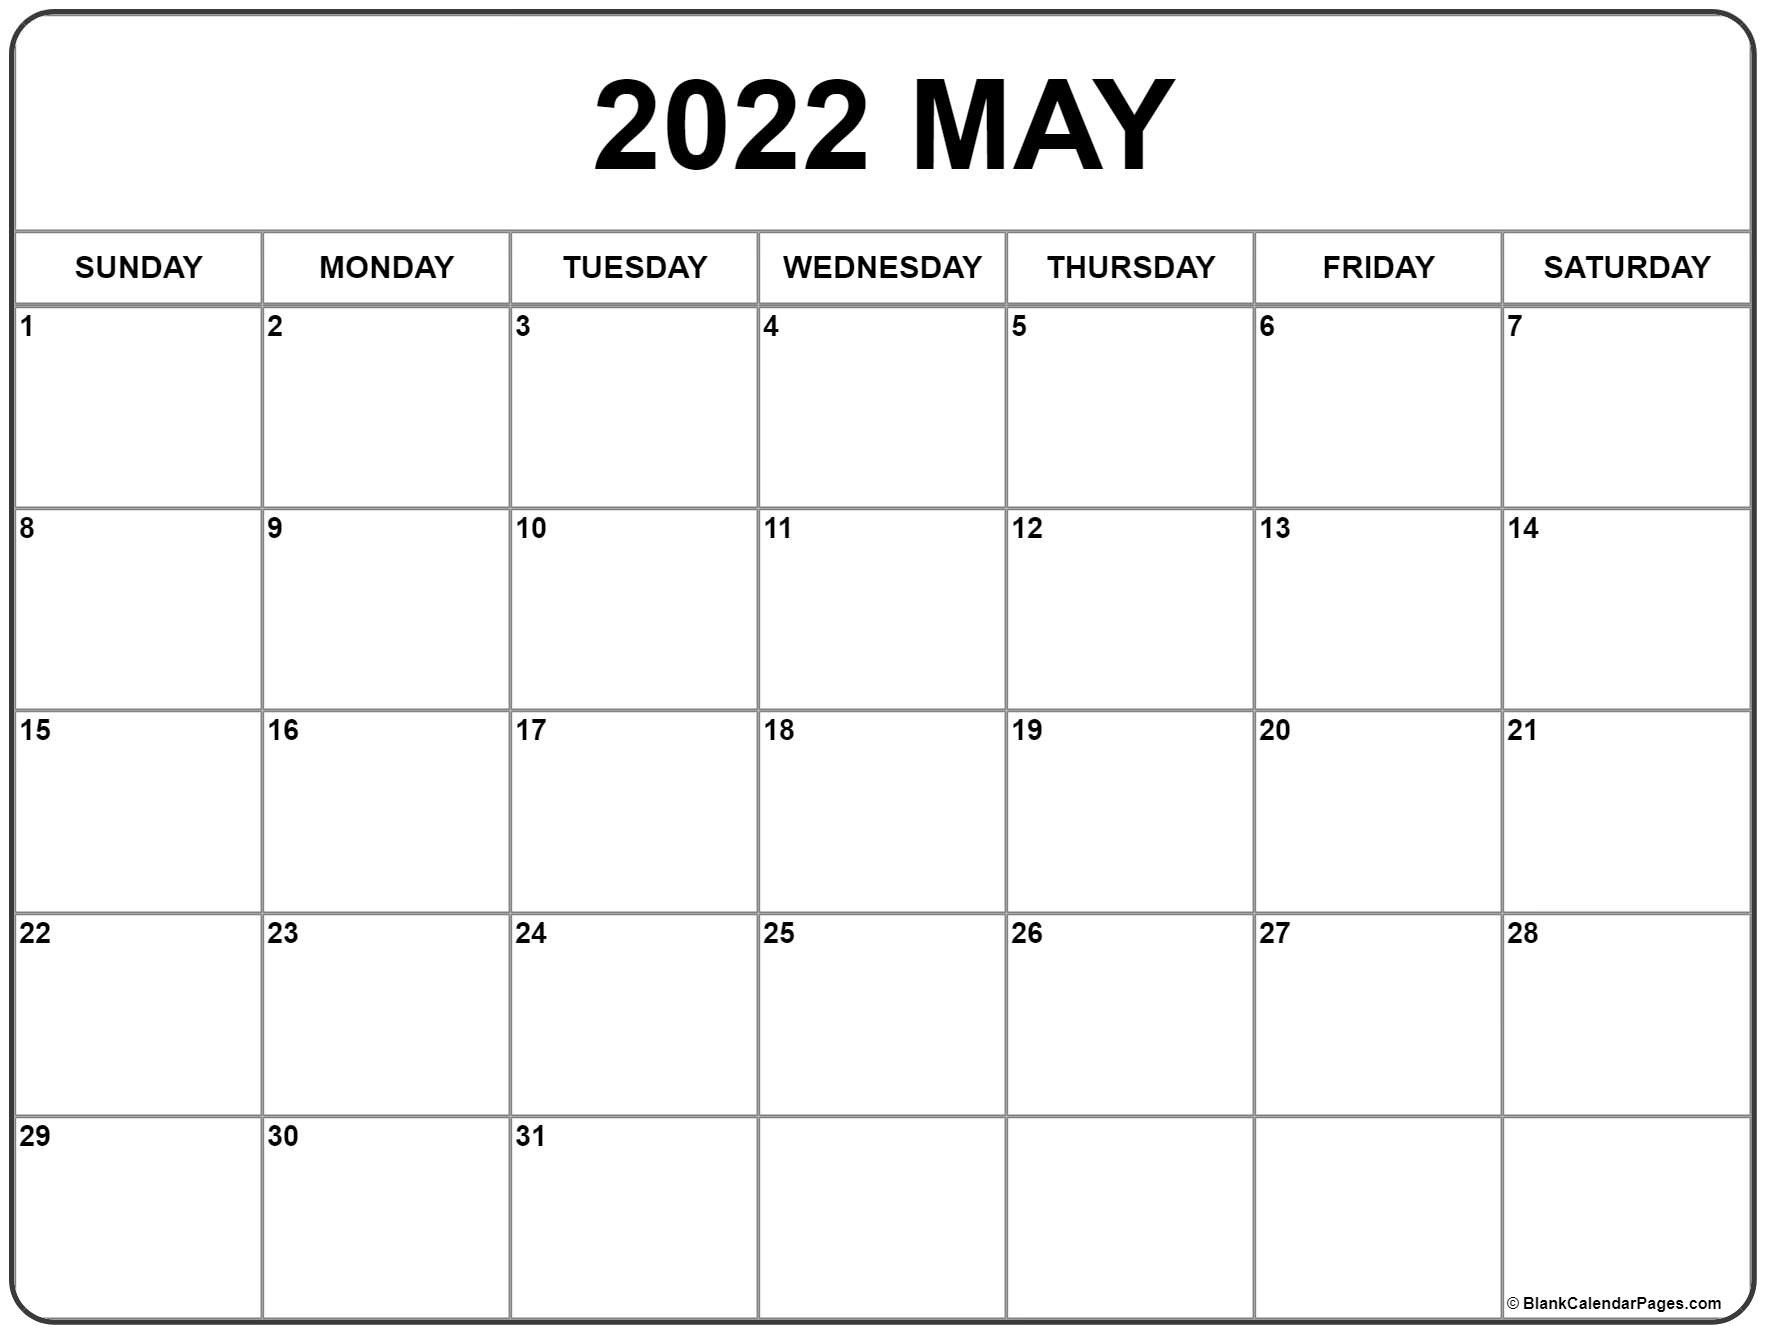 May 2022 Calendar Printable   Free Printable Calendar Monthly pertaining to Printable Calendar Month May 2022